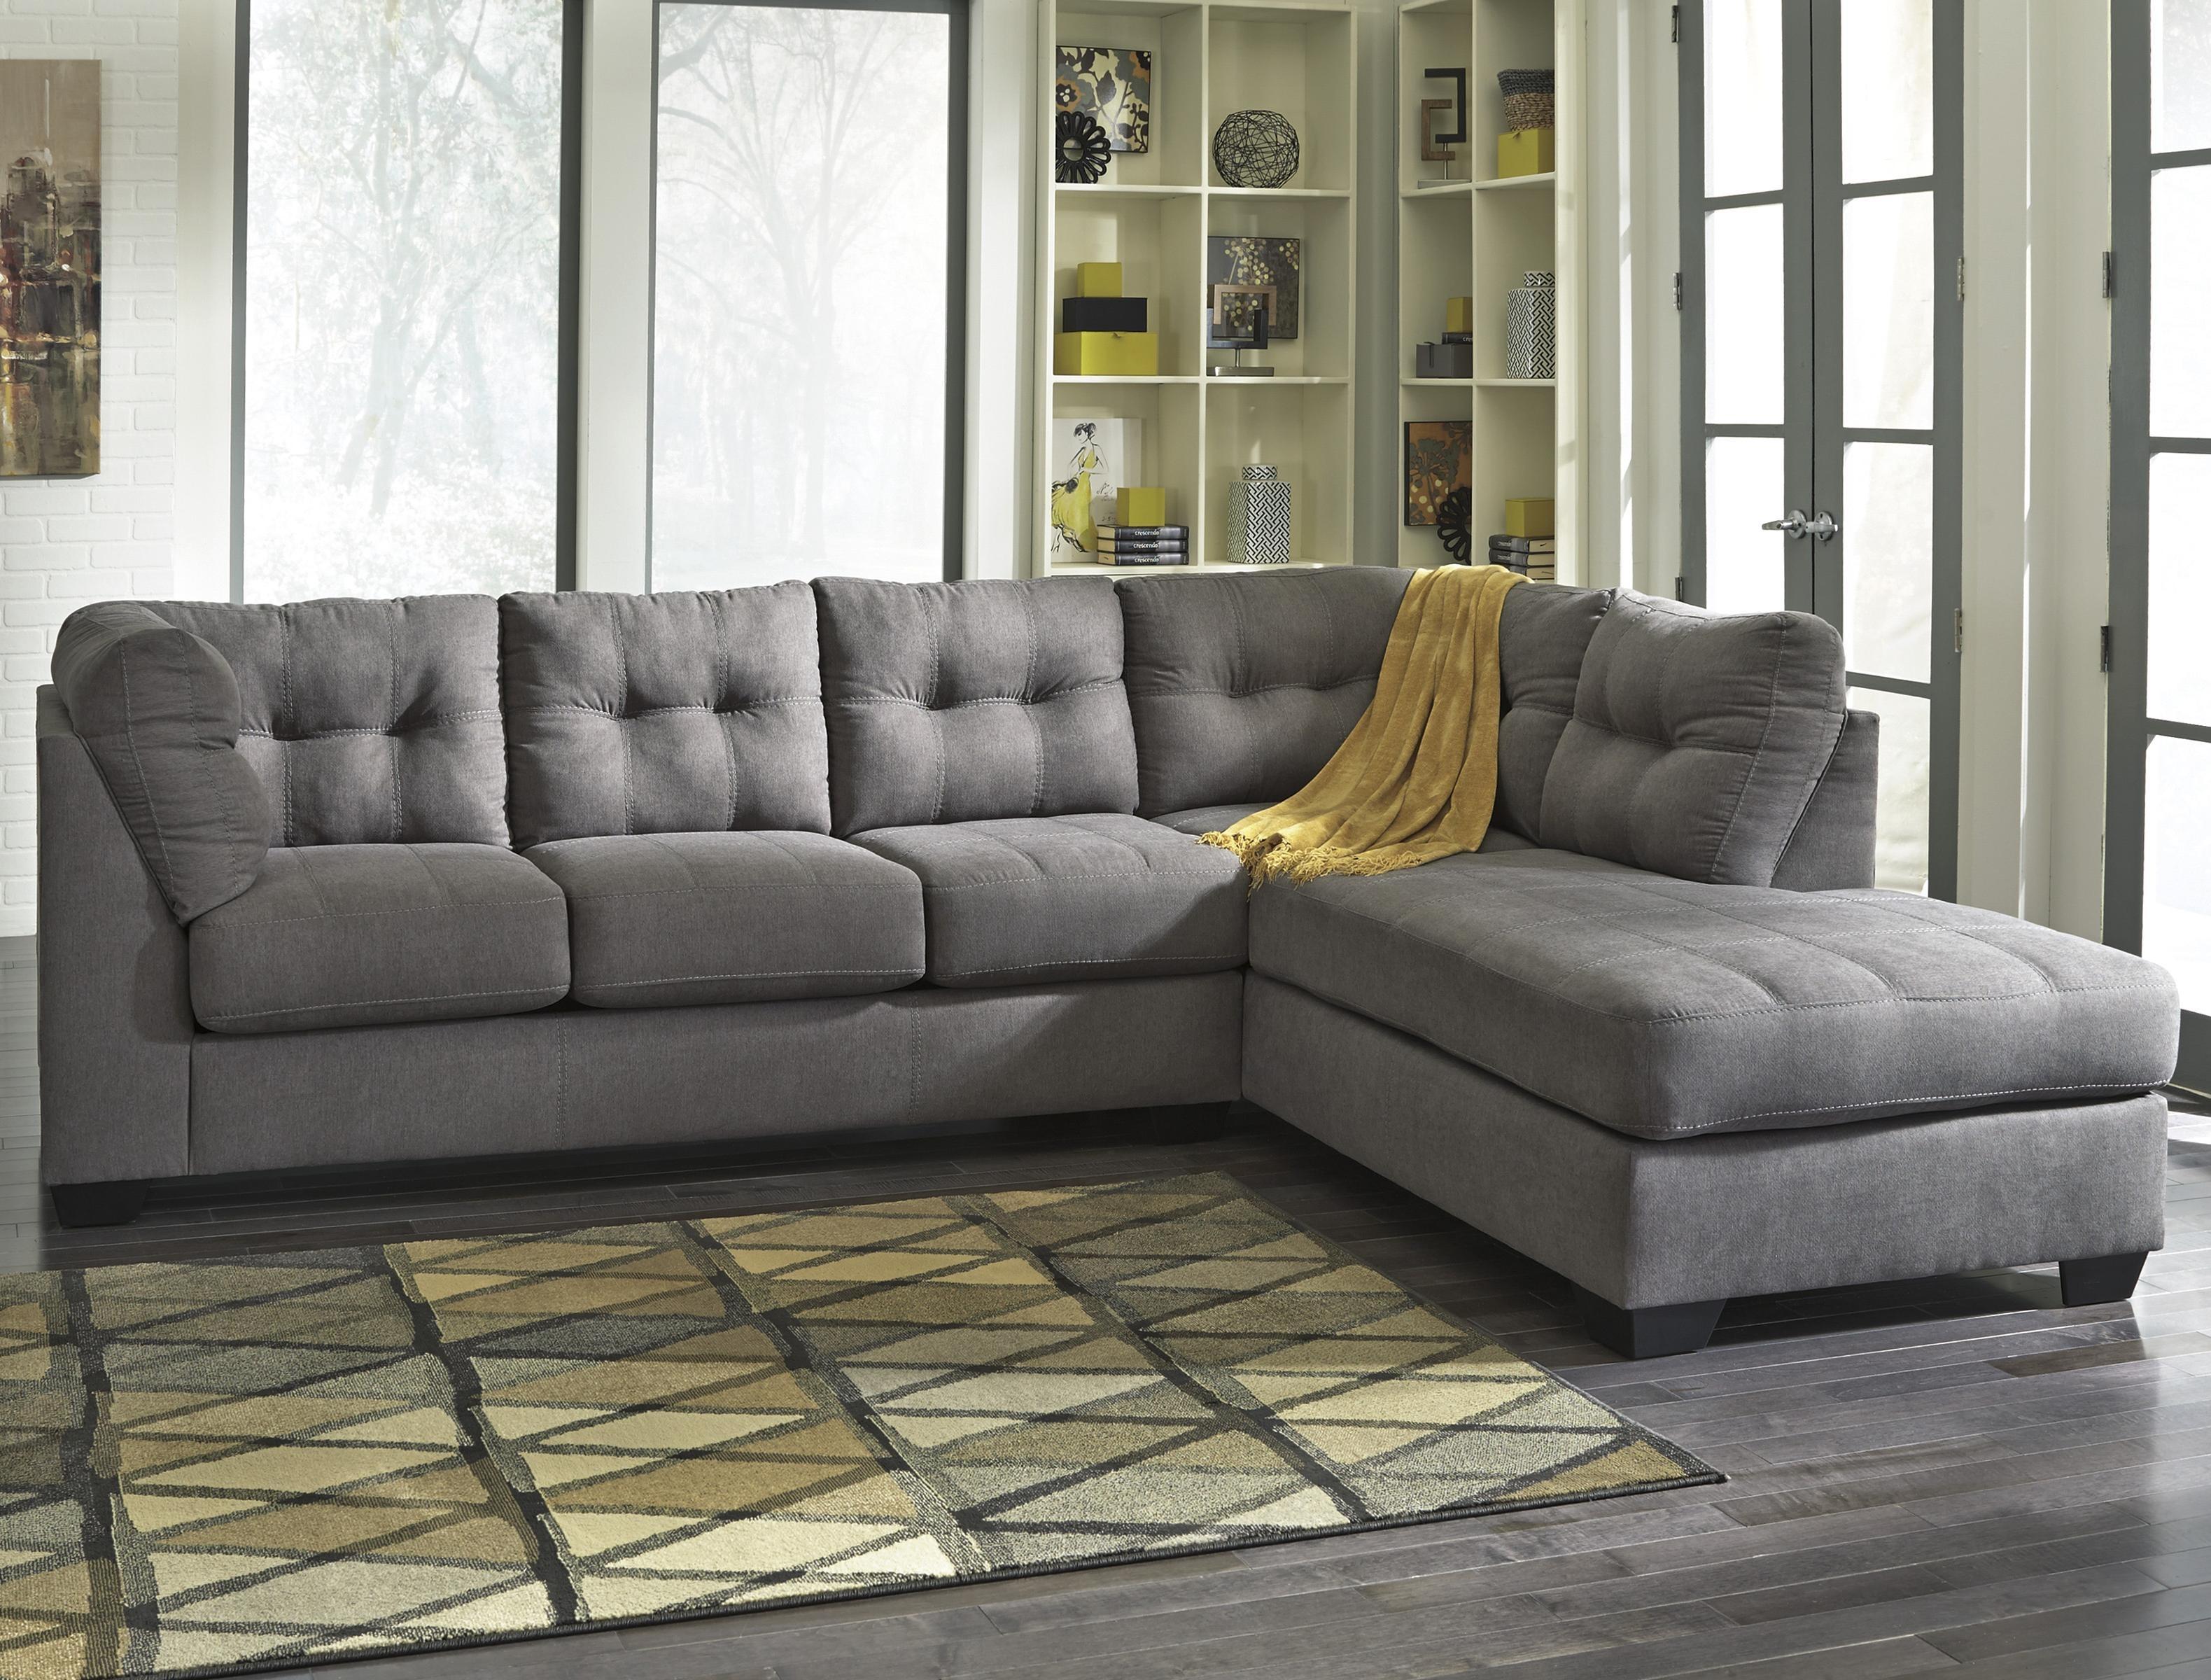 3 Piece Sectional Sleeper Sofa - Hotelsbacau in 3 Piece Sectional Sleeper Sofas